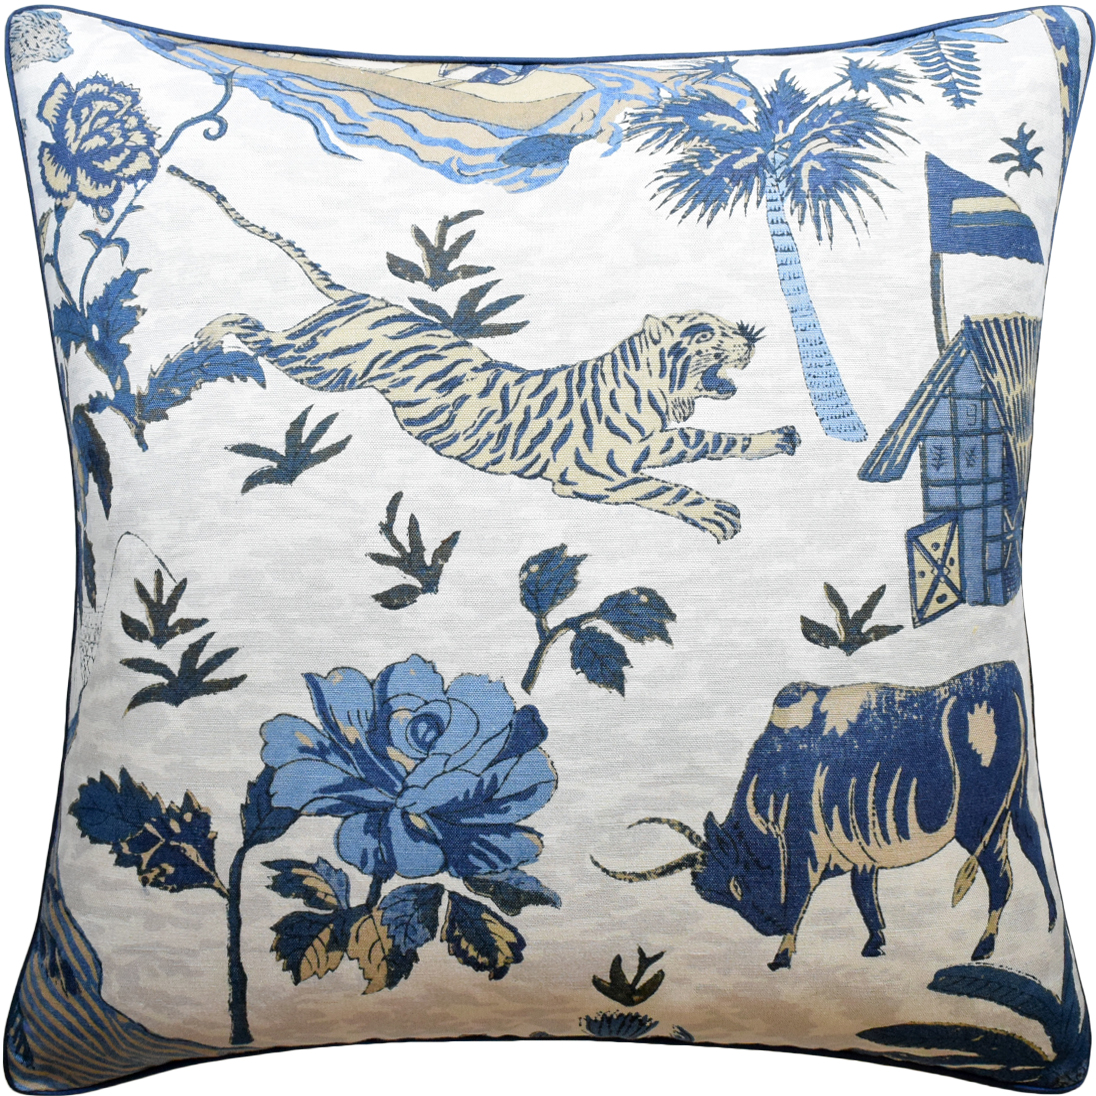 Tiger Reserve Navy Pillow